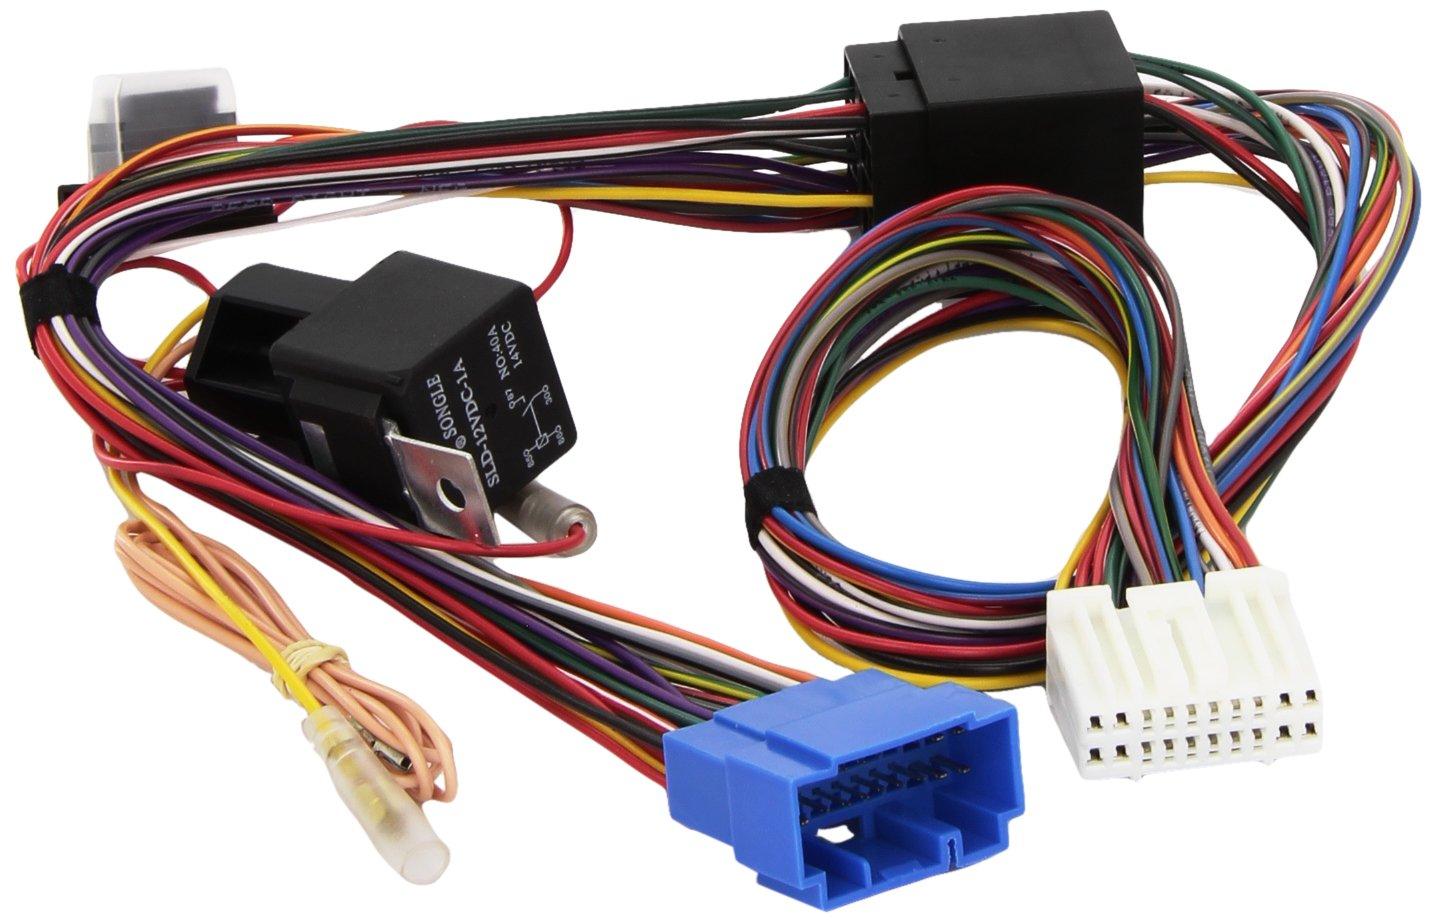 Autoleads SOT-047 - Adaptador de interfaz para Armour Group Plc